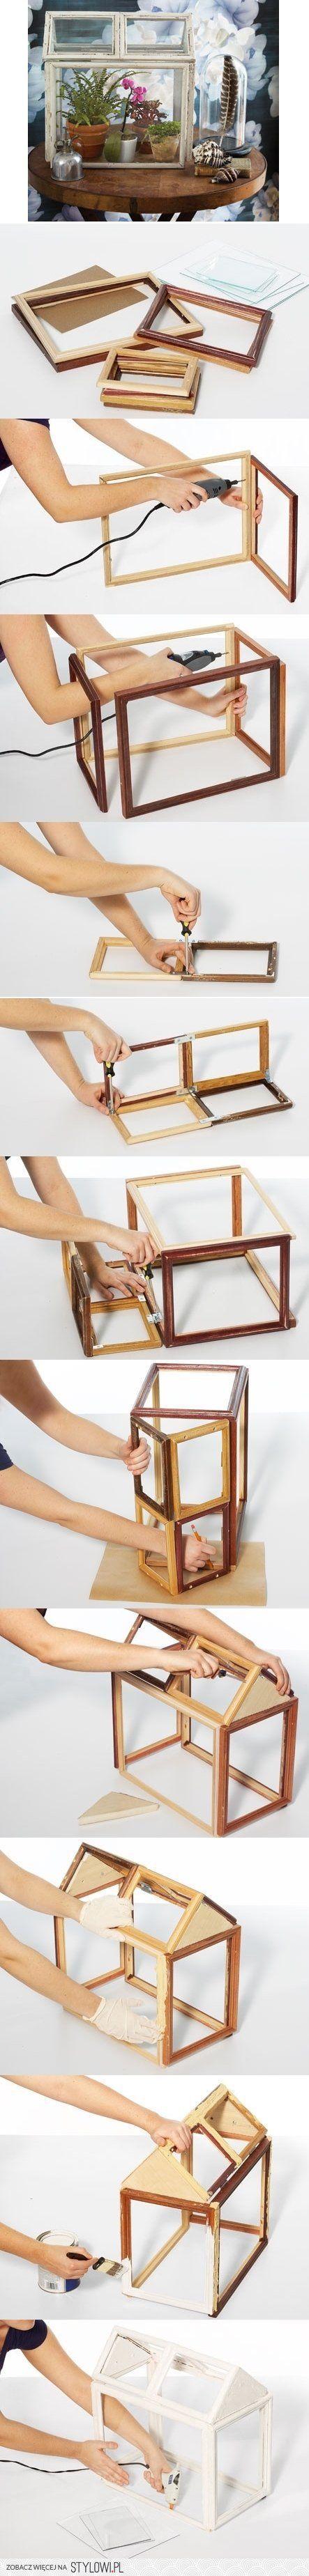 INSPIRATION: Mini greenhouse